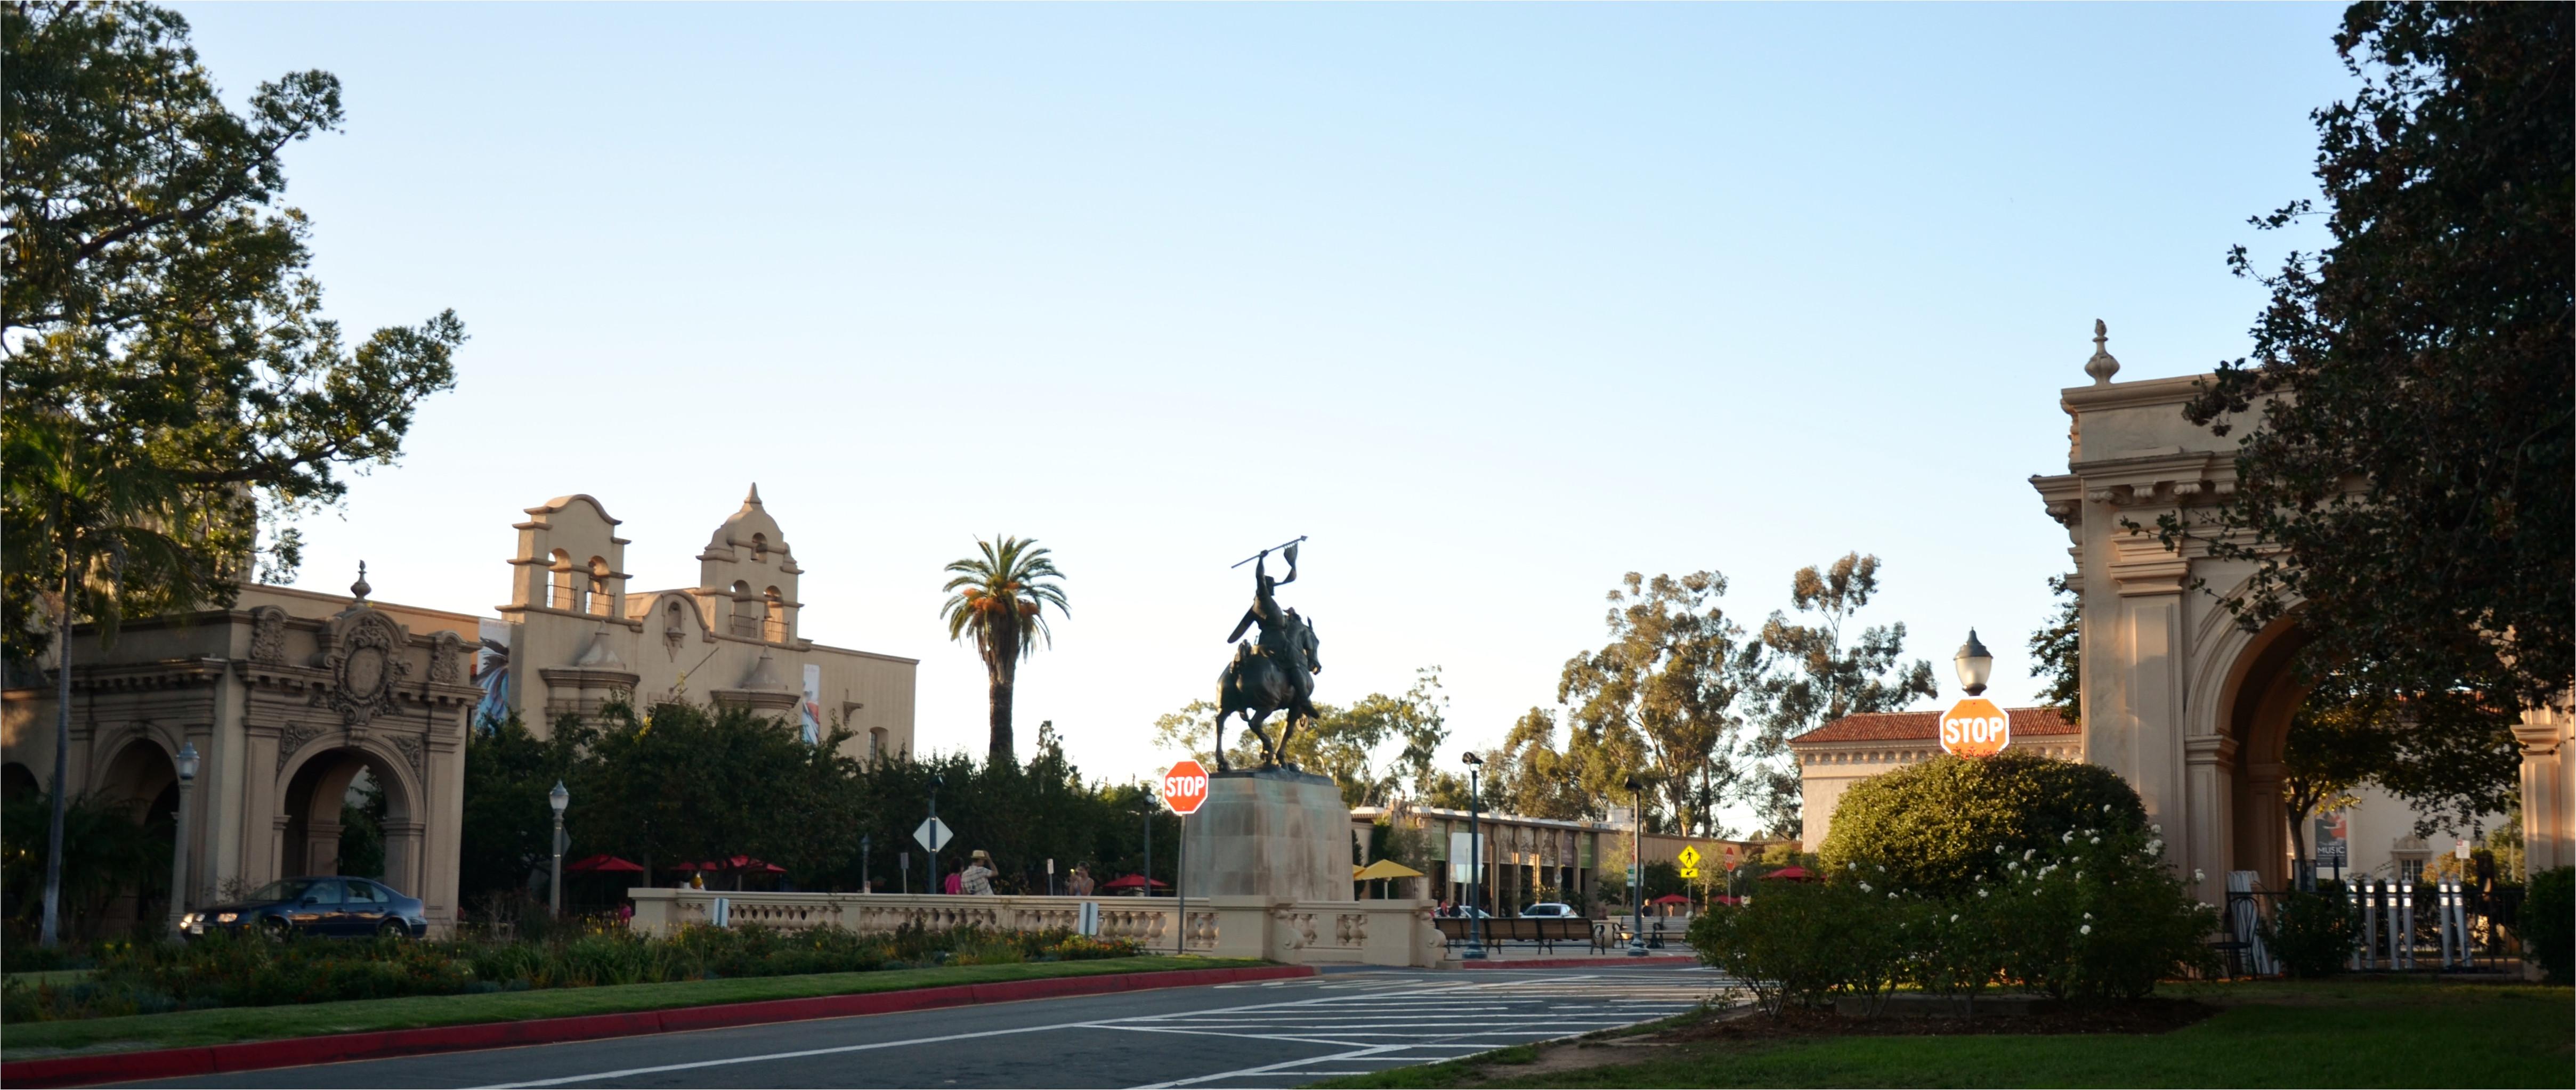 Que Ver En San Diego Eeuu File Balboa Park San Diego Ca Usa Panoramio 199 Jpg